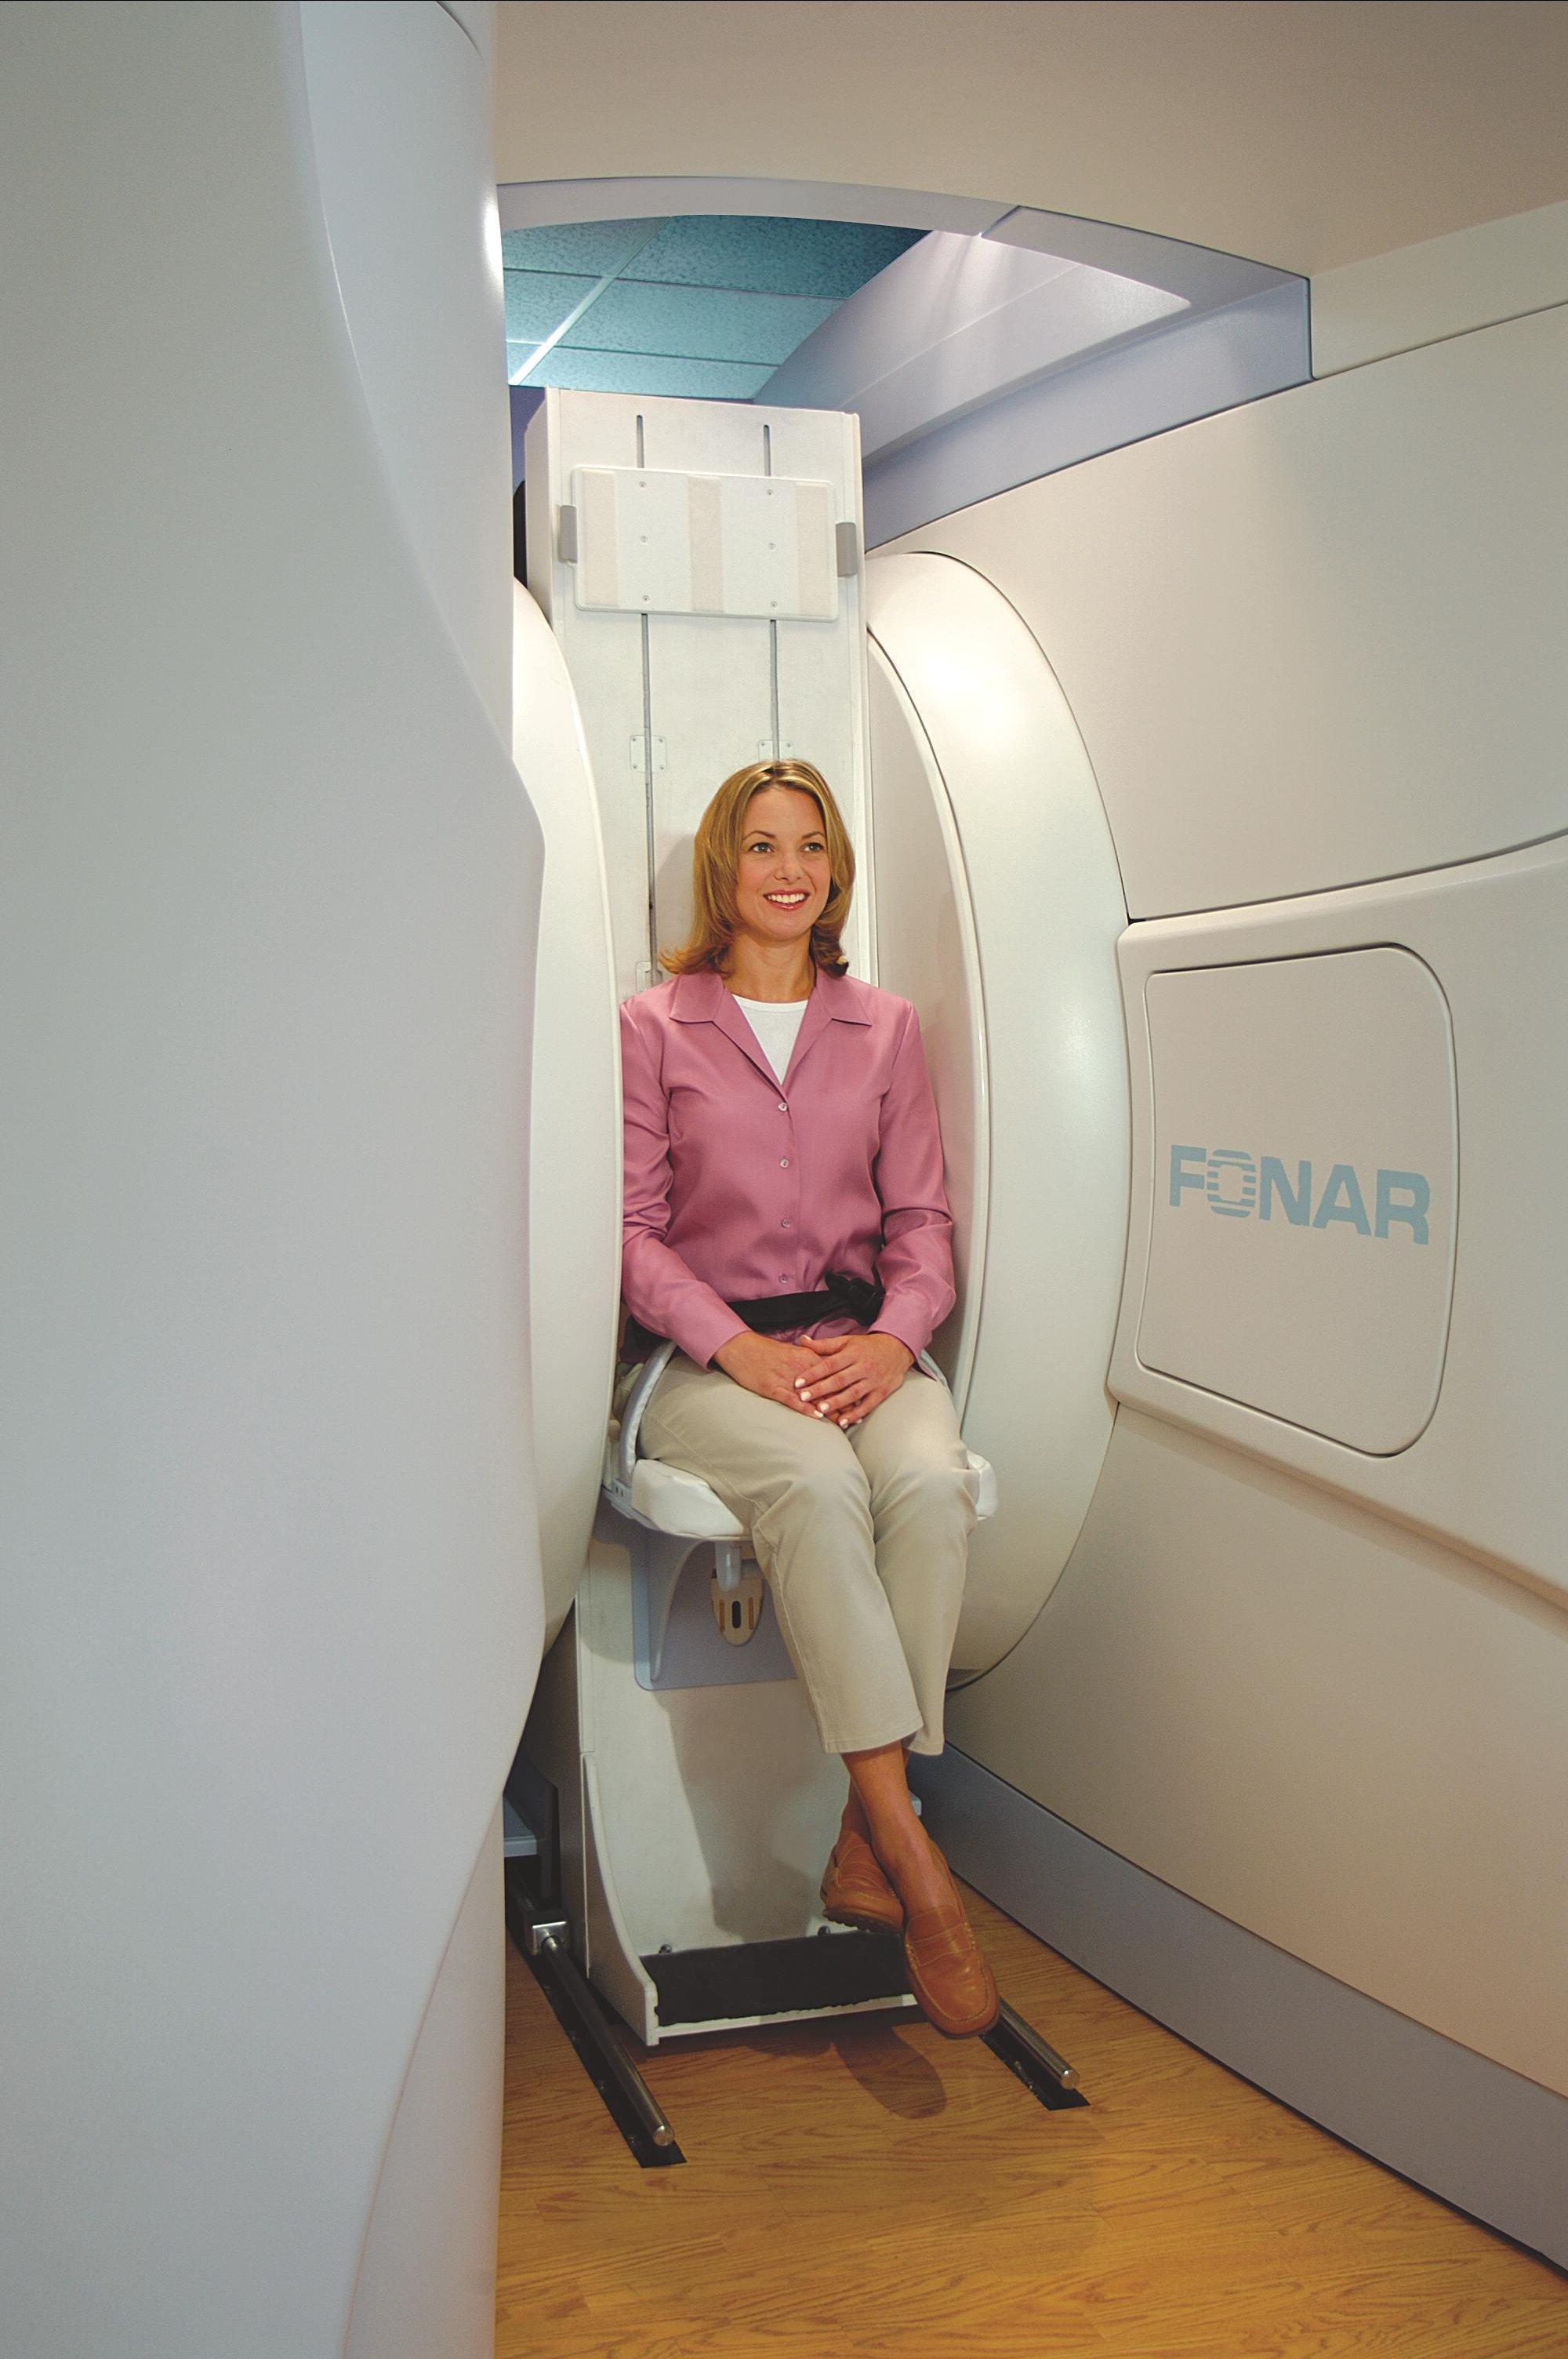 Upright MRI of Deerfield image 0